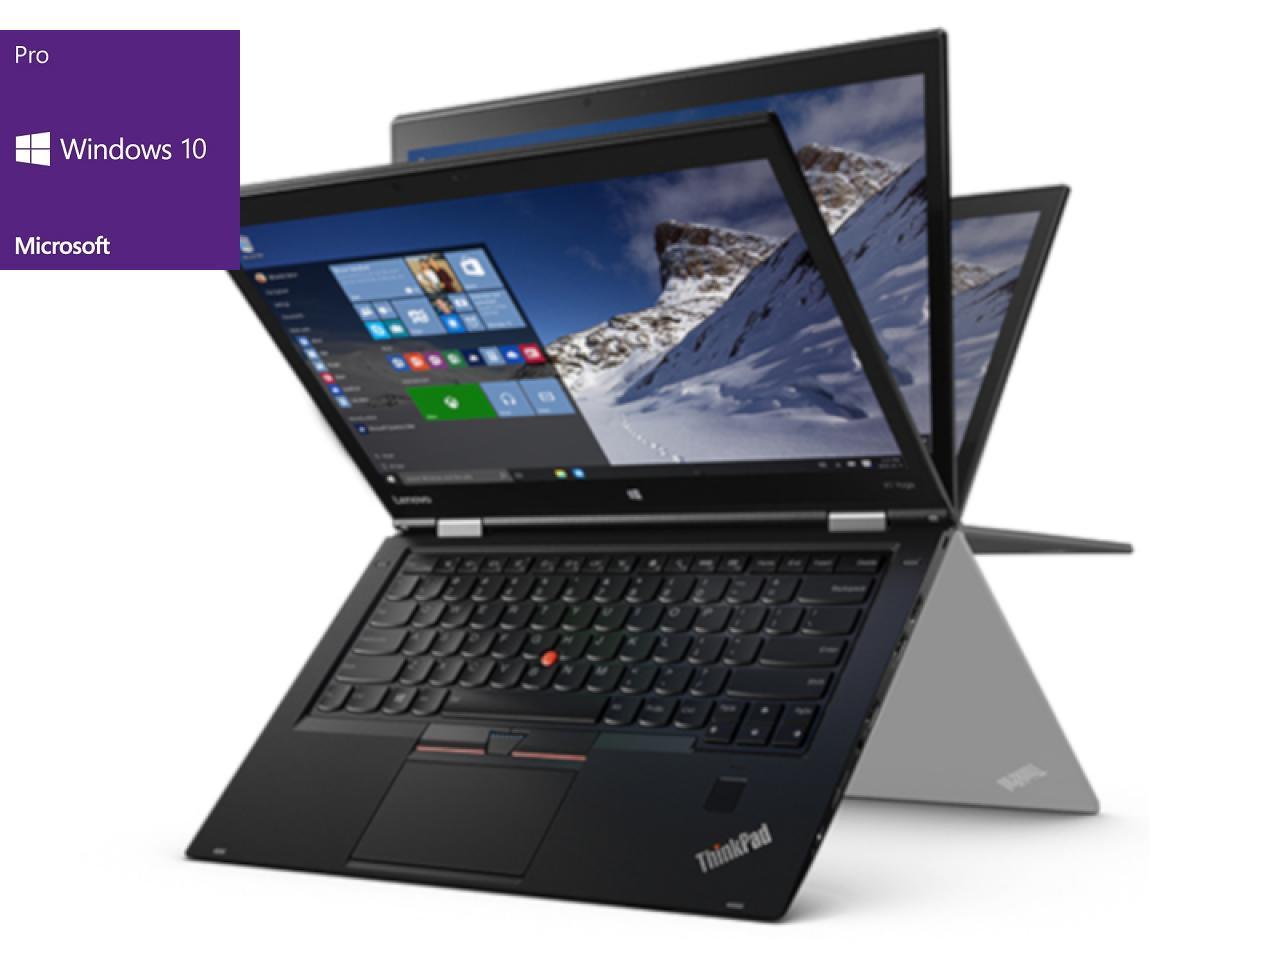 Lenovo ThinkPad X1 Yoga 1st Gen  - shop.bb-net.de